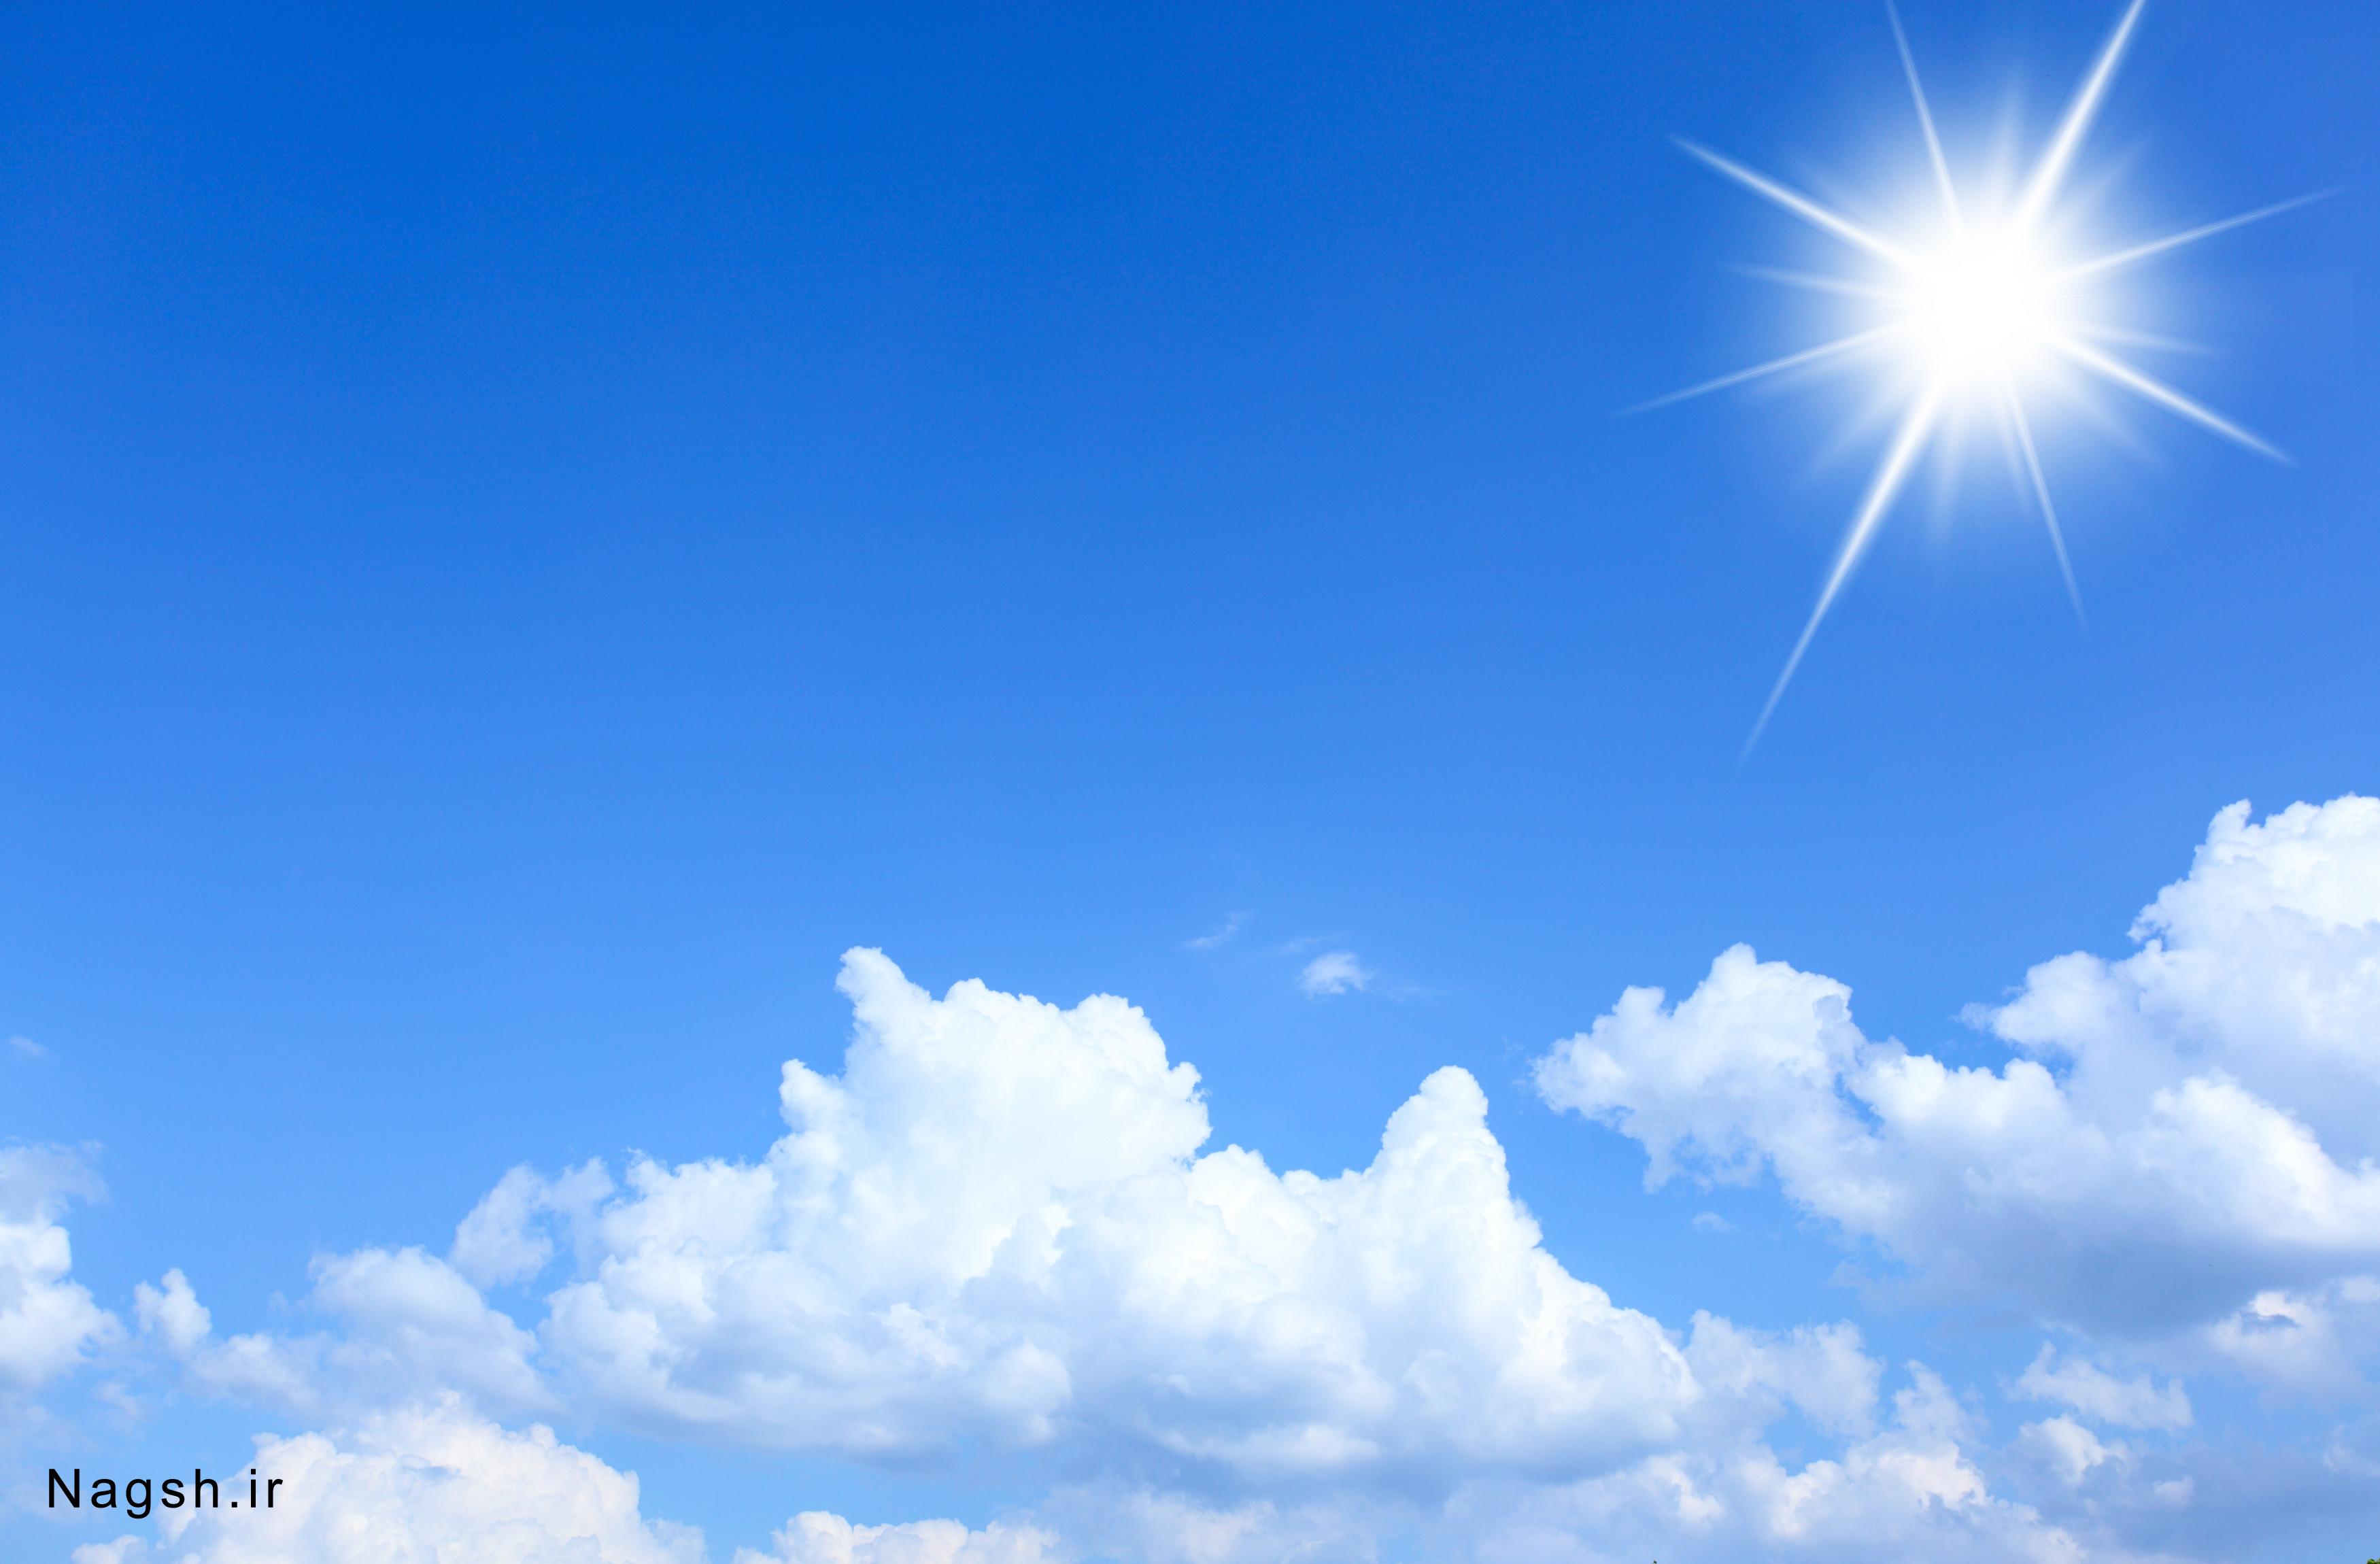 روز آسمان